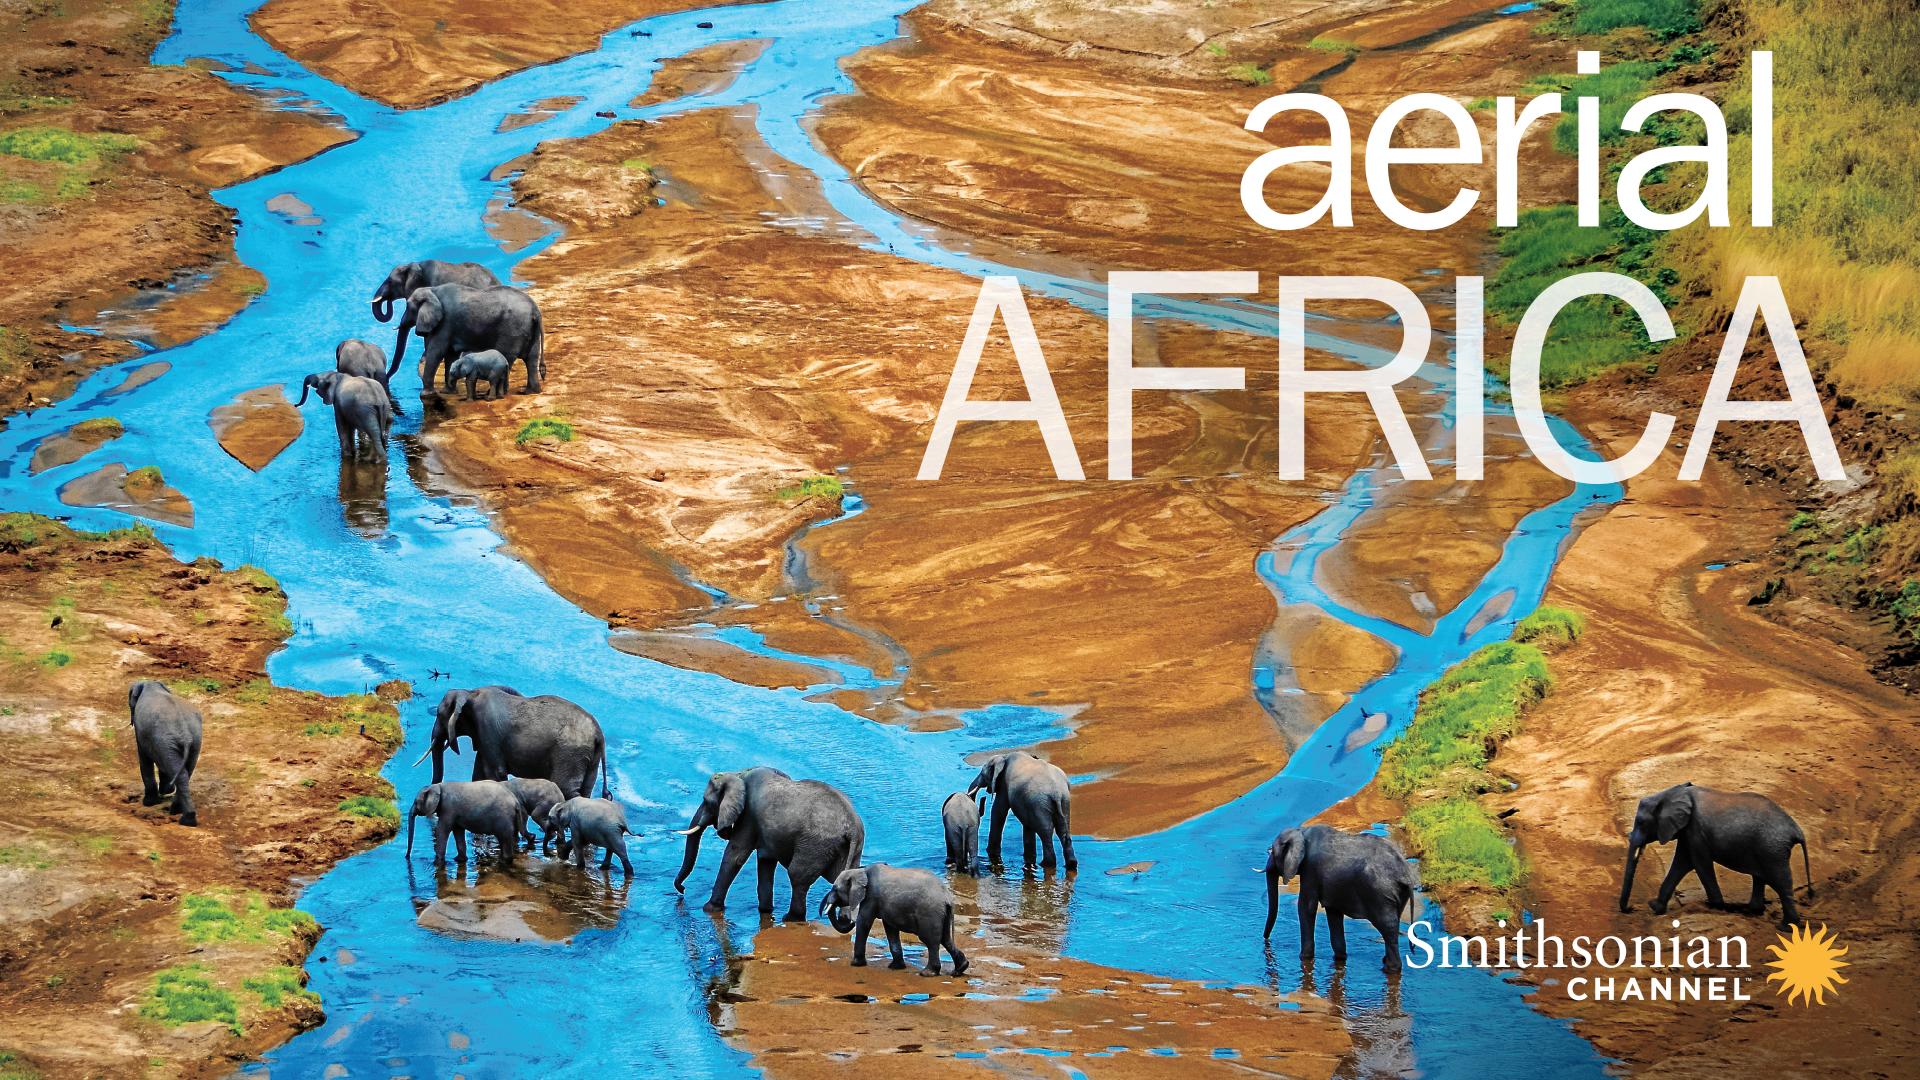 Aerial Africa - Season 1